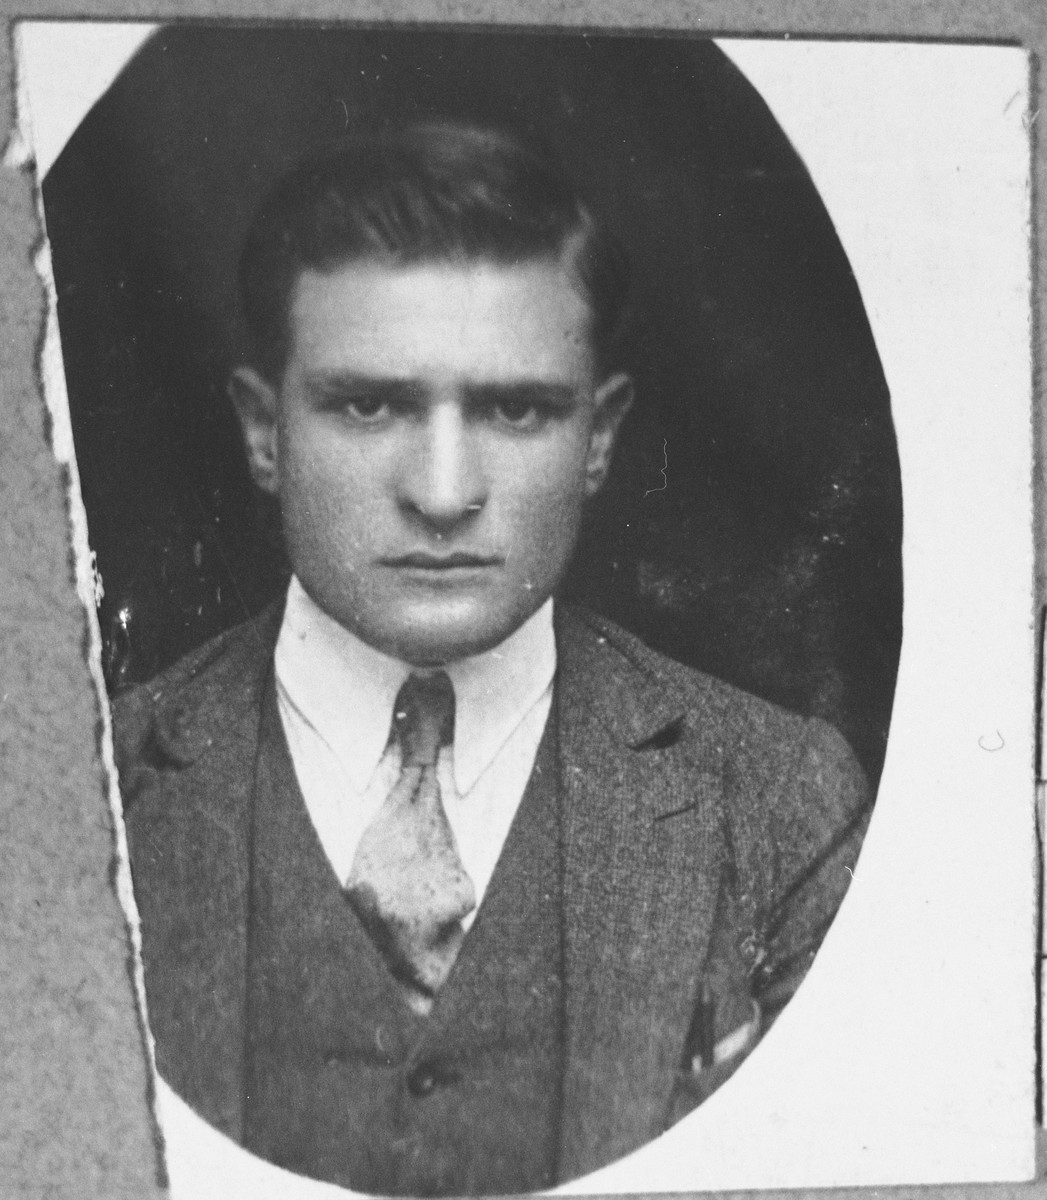 Portrait of Eliau Kassorla, son of Solomon Kassorla.  He was a grocer.  He lived at Drinska 81 in Bitola.